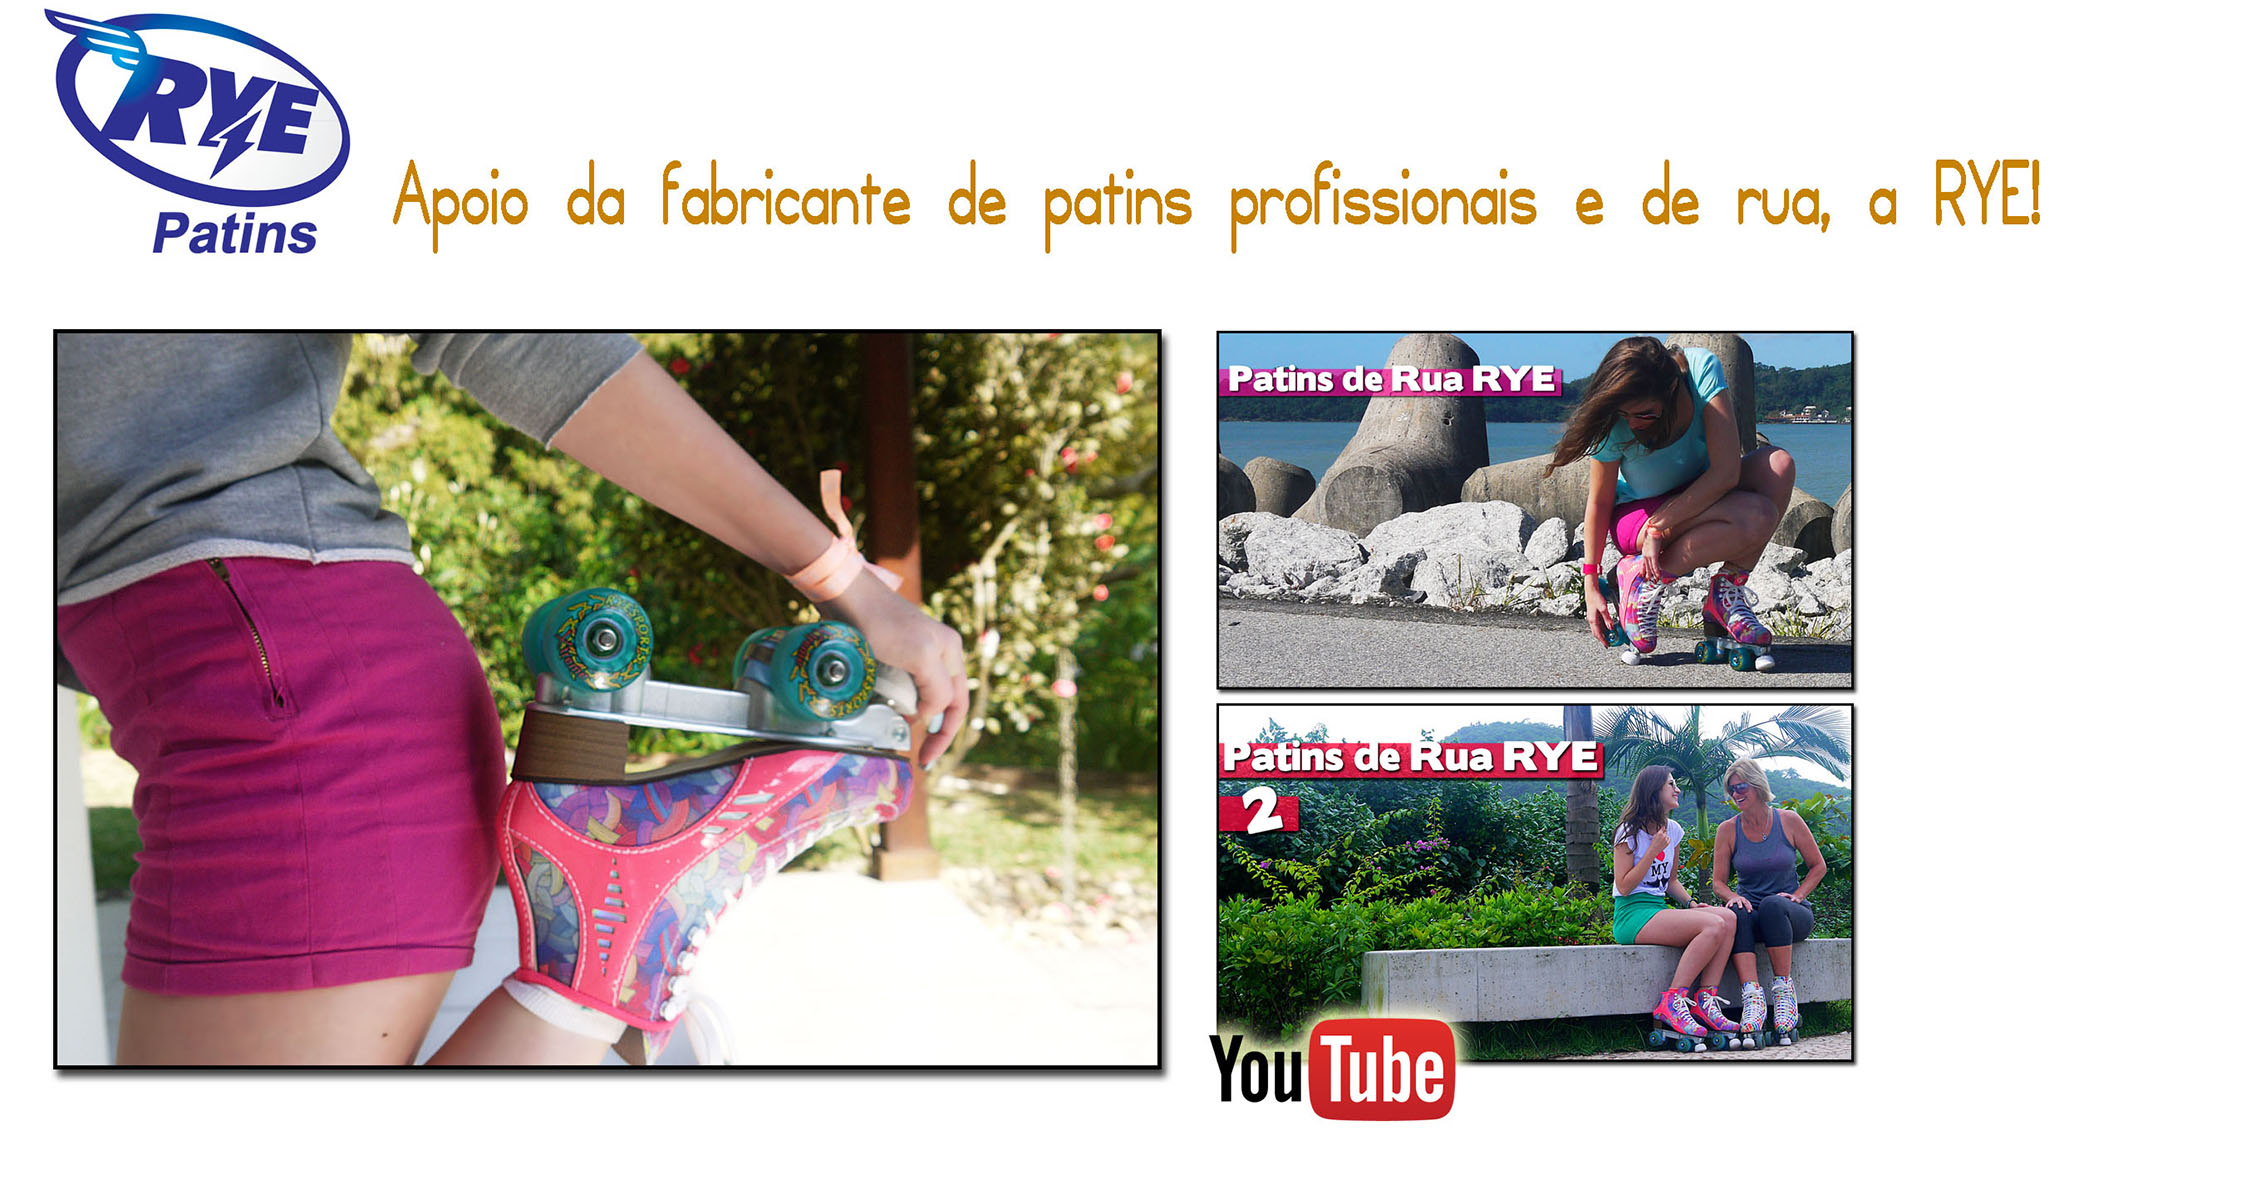 camilla-guerra-canal-blog-patinação-artística-patins-vídeo-do-youtube-rye-patins-loja-online-apoio